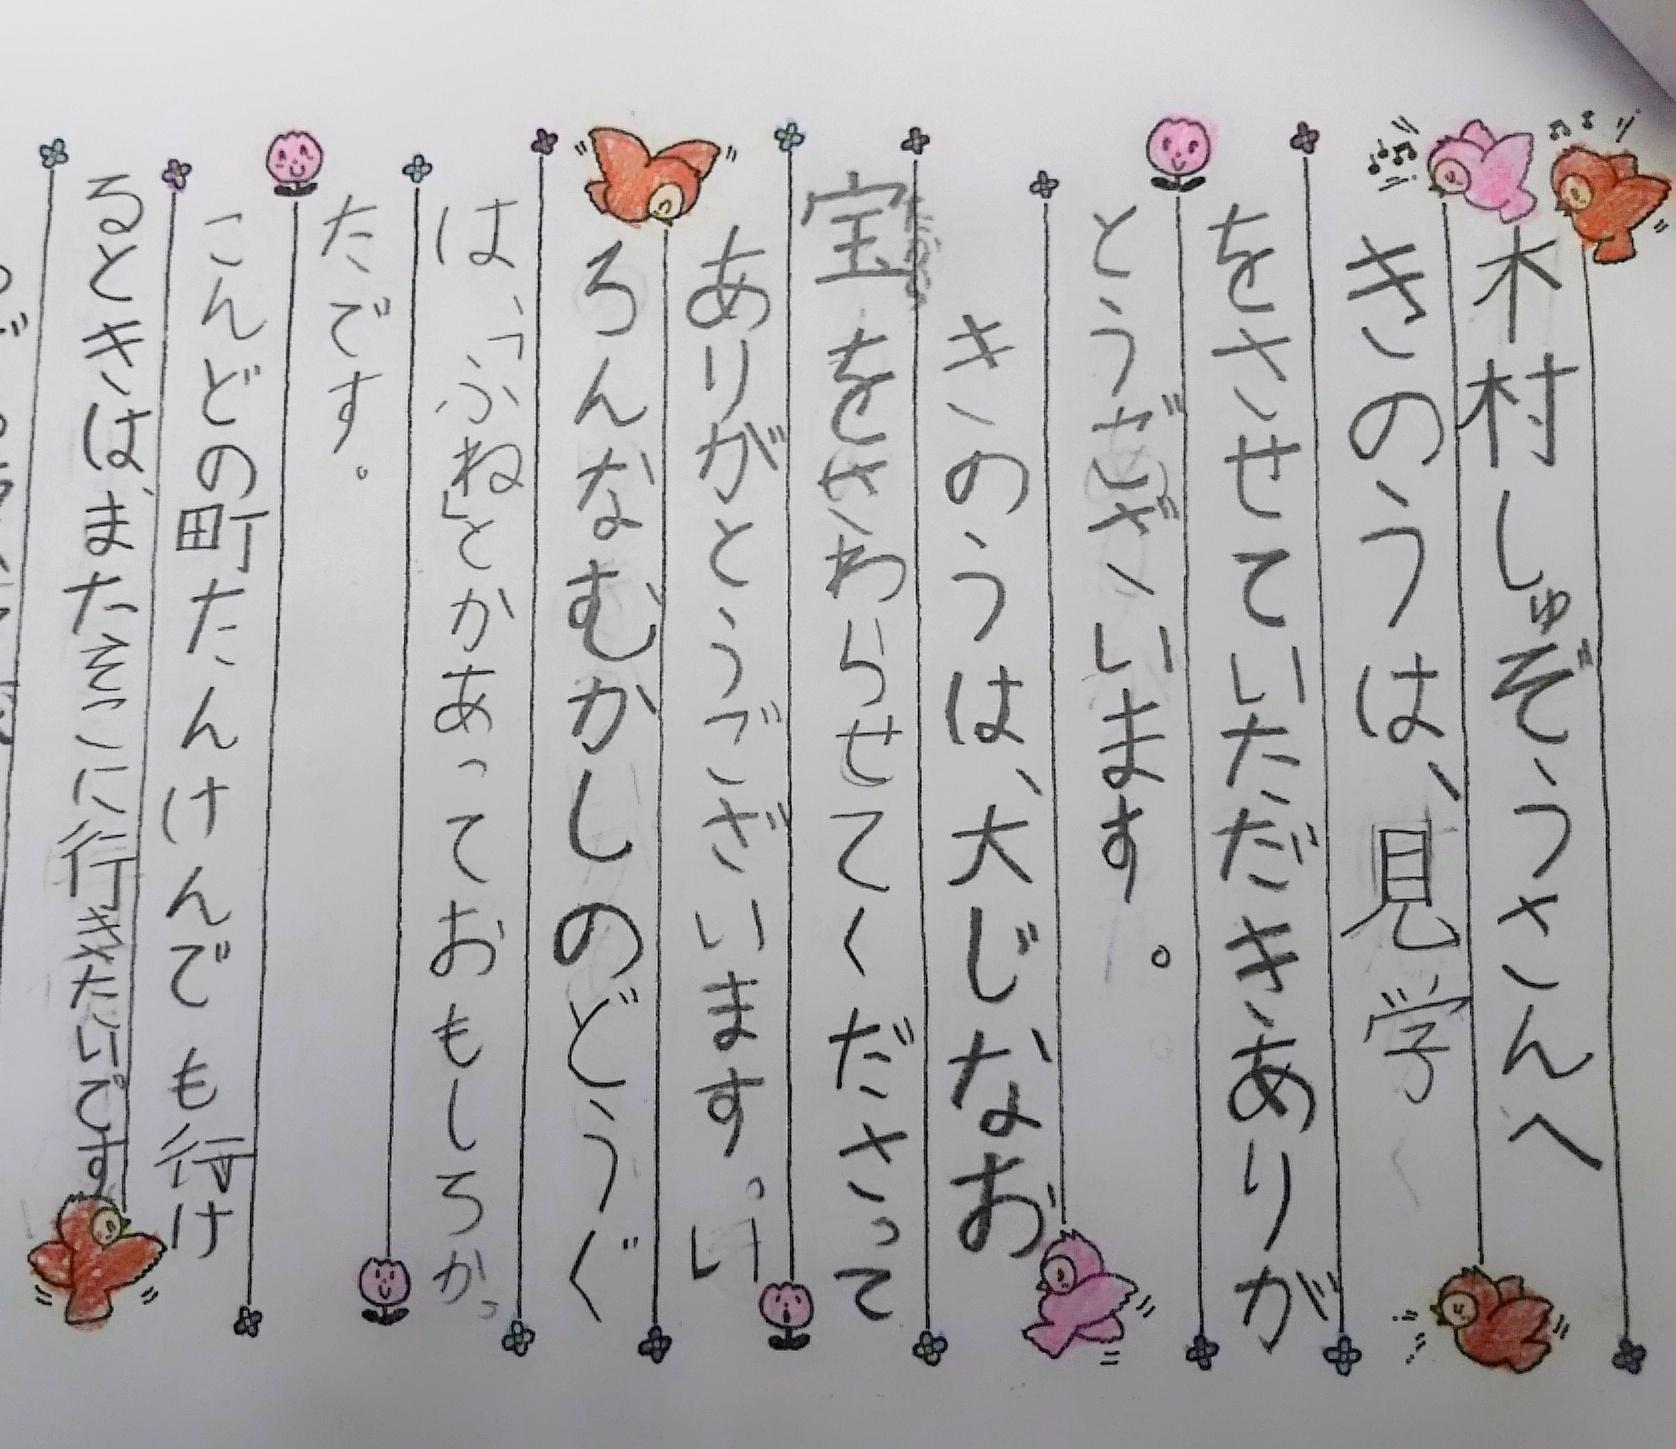 http://www.fukukomachi.com/blog/photo/C360_2017-10-25-09-31-57-843.jpg